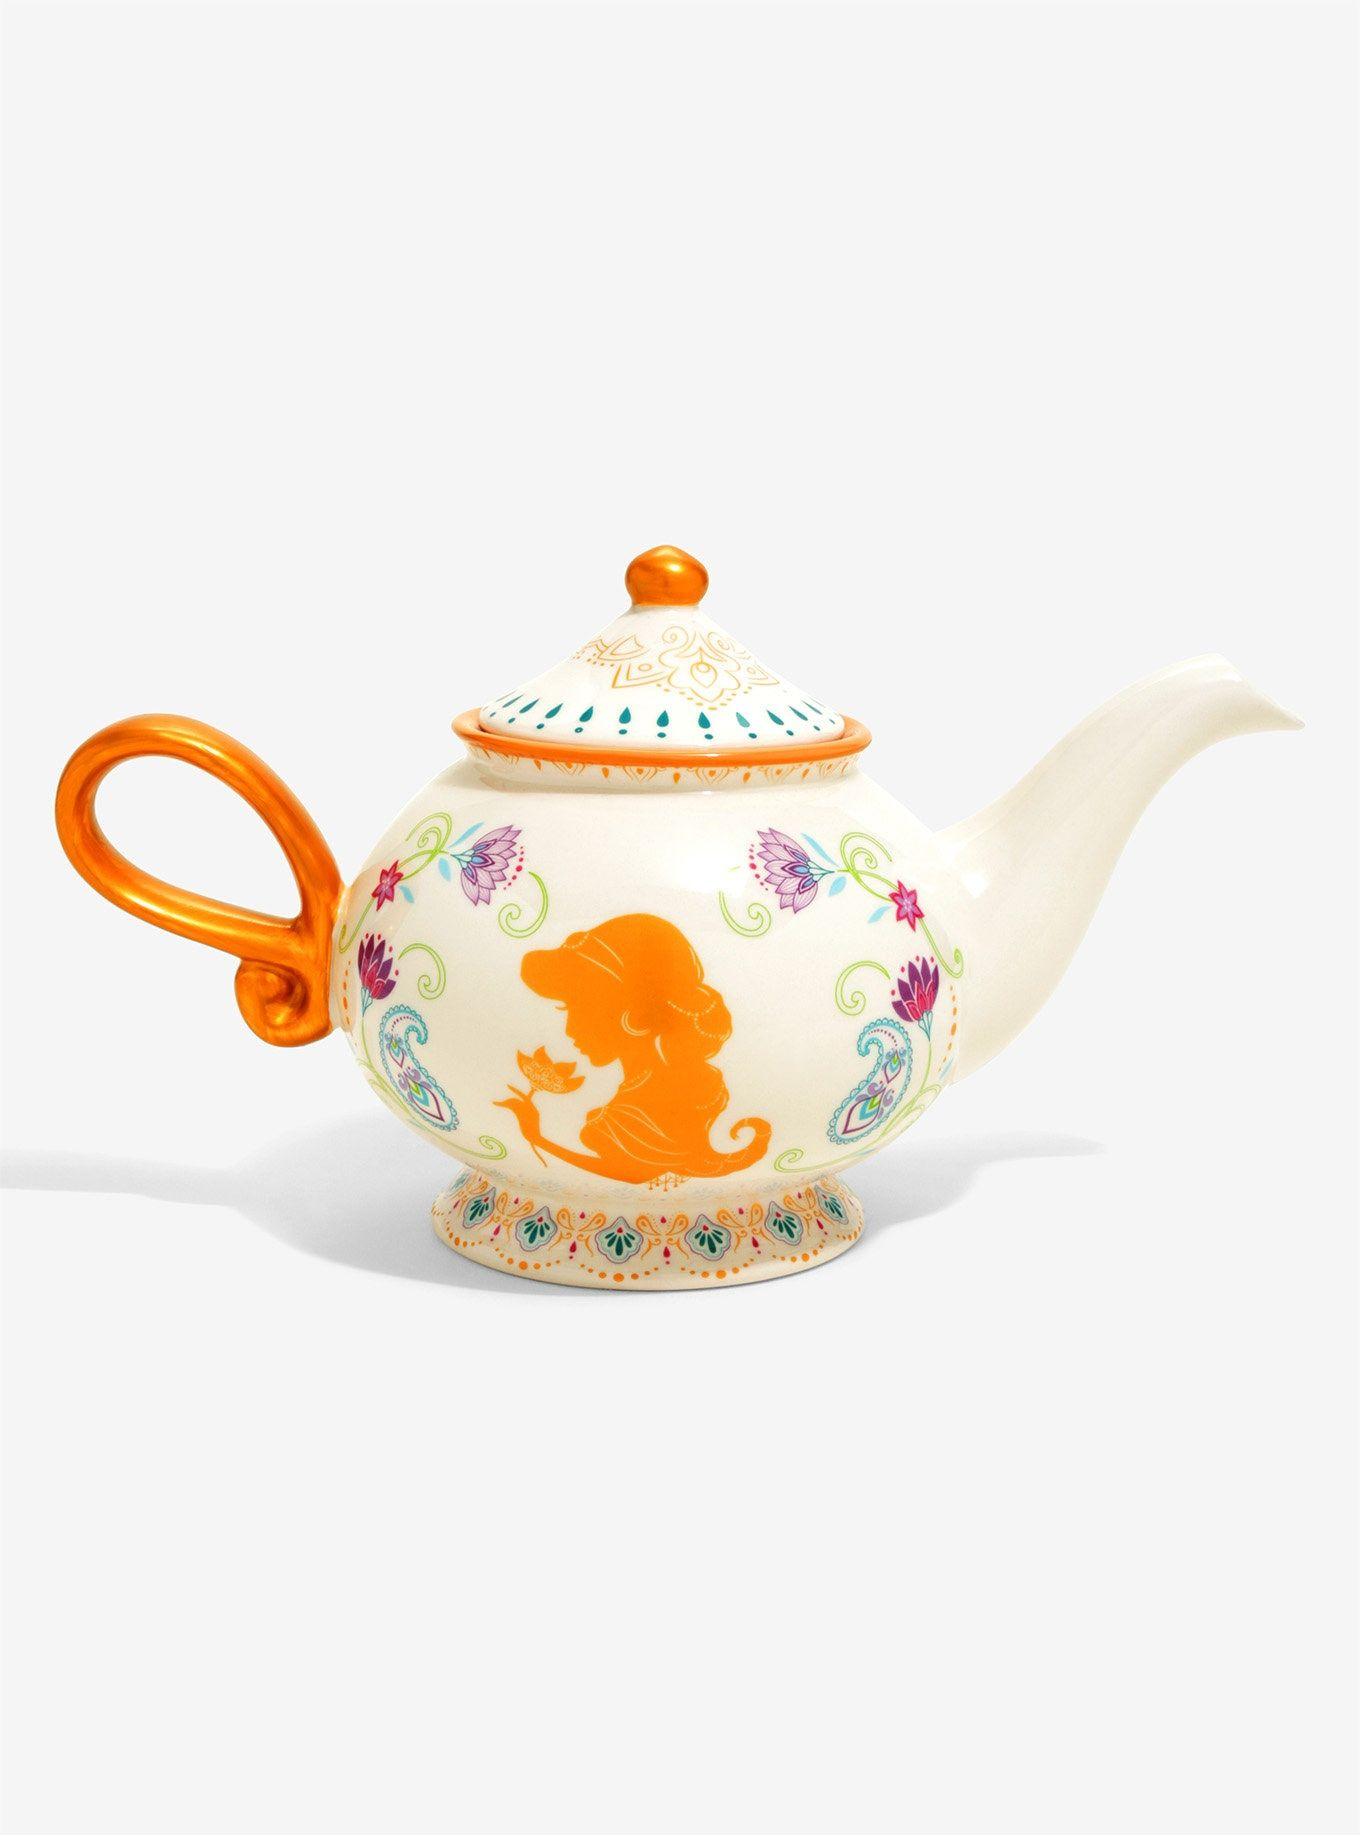 DISNEY ALADDIN DECORATIVE THREE WISHES GENIE LAMP SHAPED TEA POT AND GLASSES